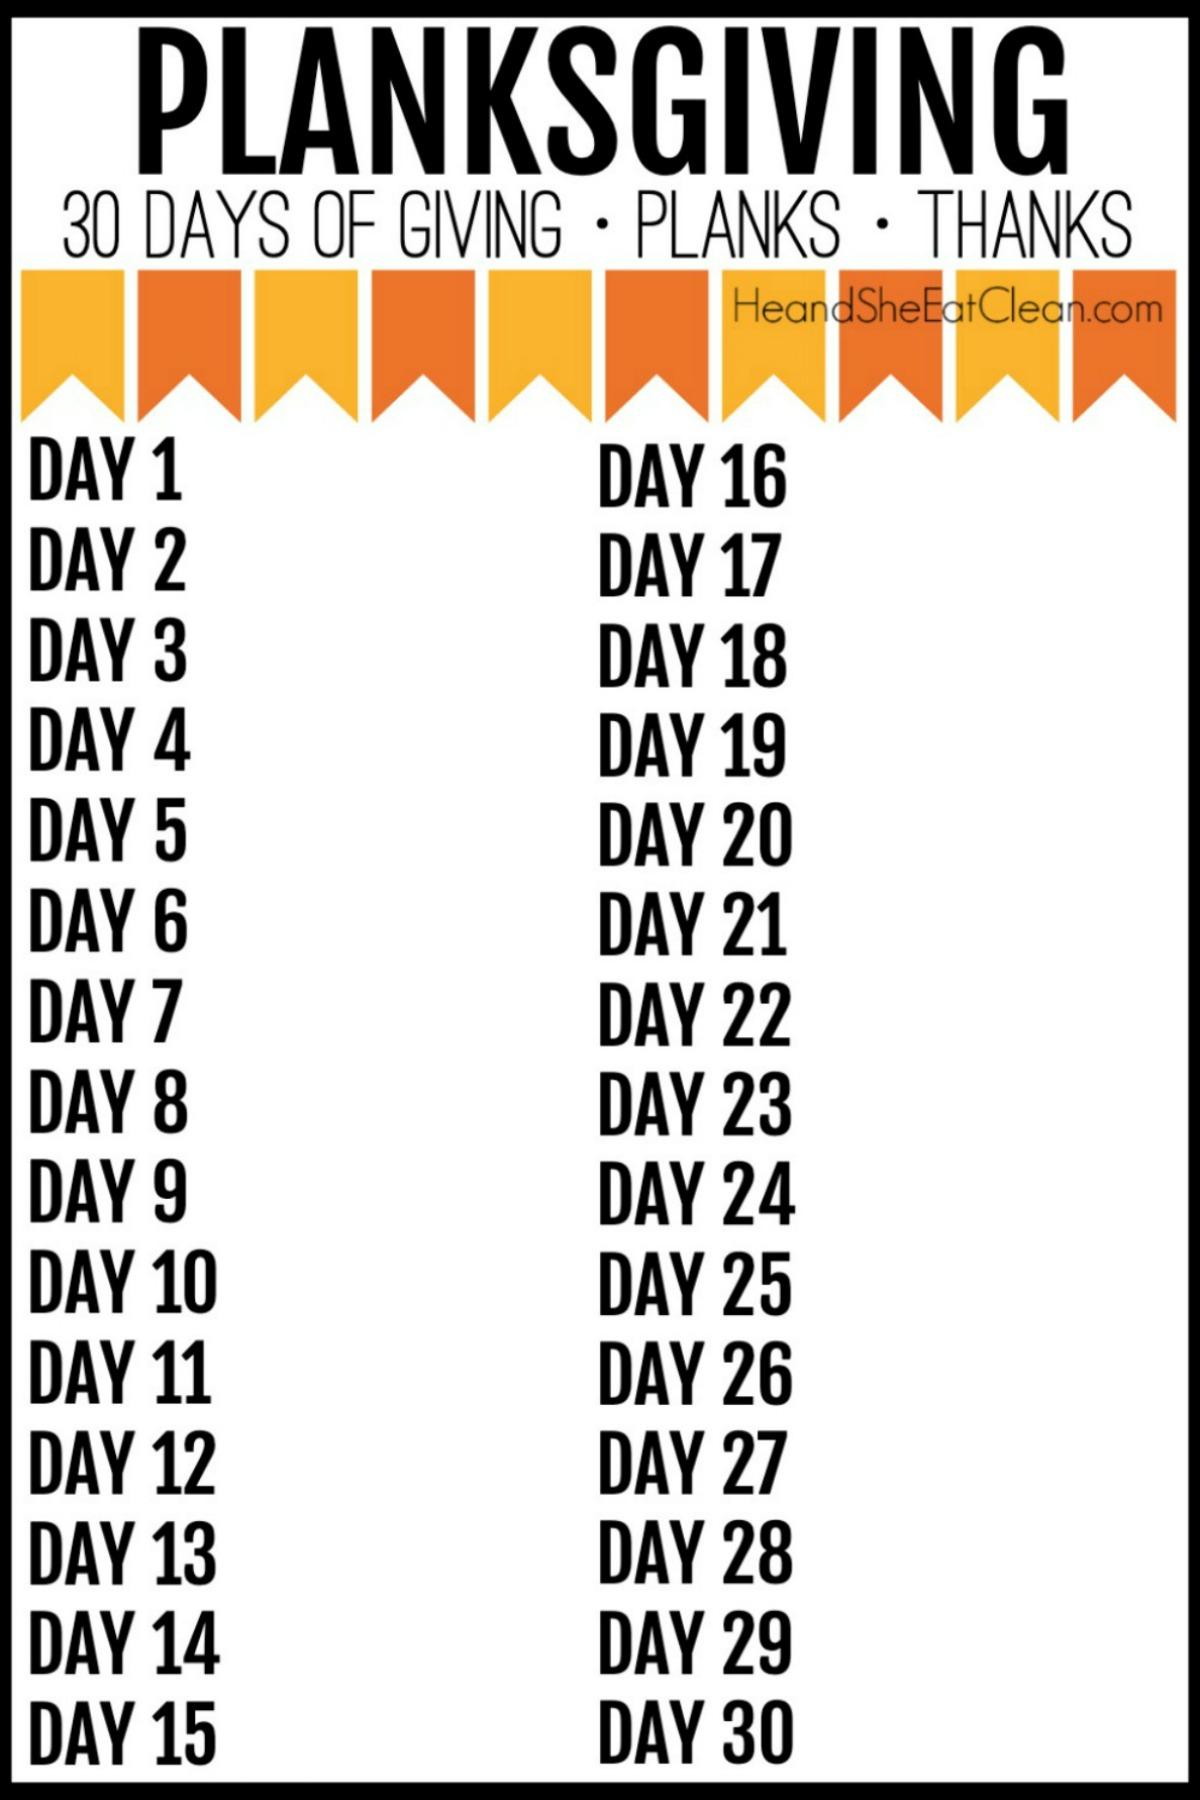 30 days of thanks & giving blank calendar list